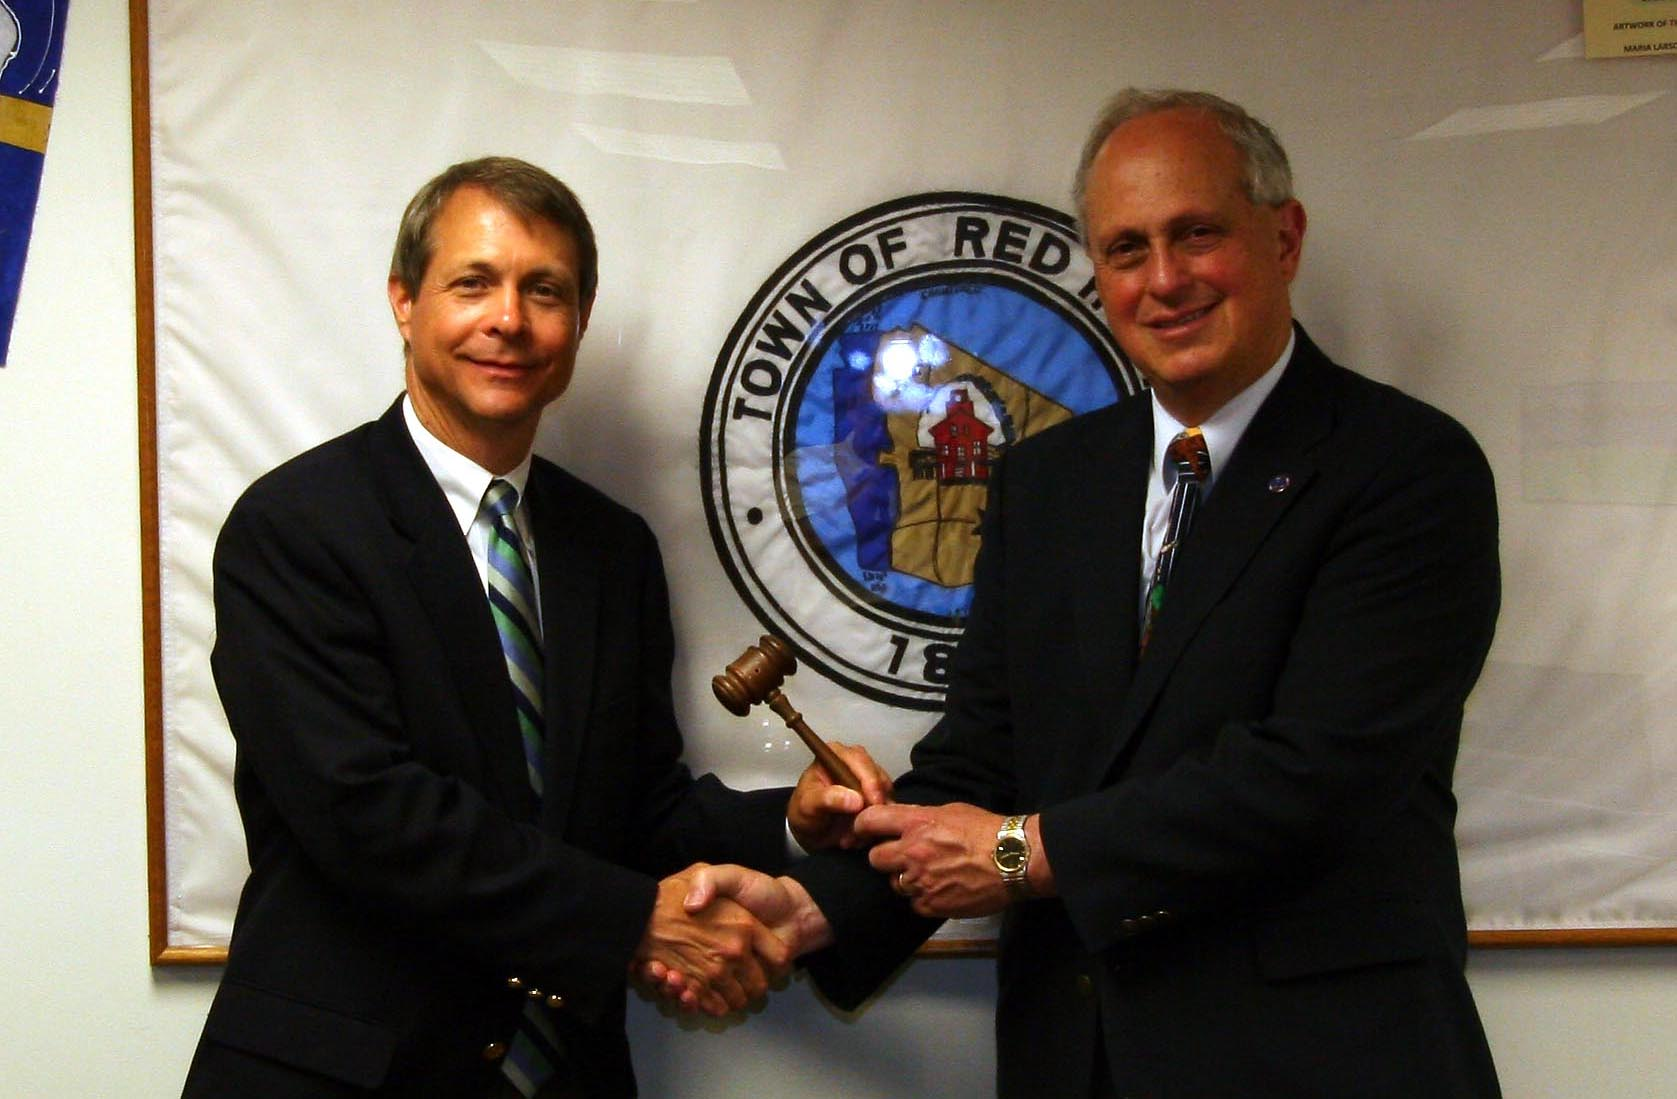 Judge Jeffrey Martin and Judge Jonah Triebwasser